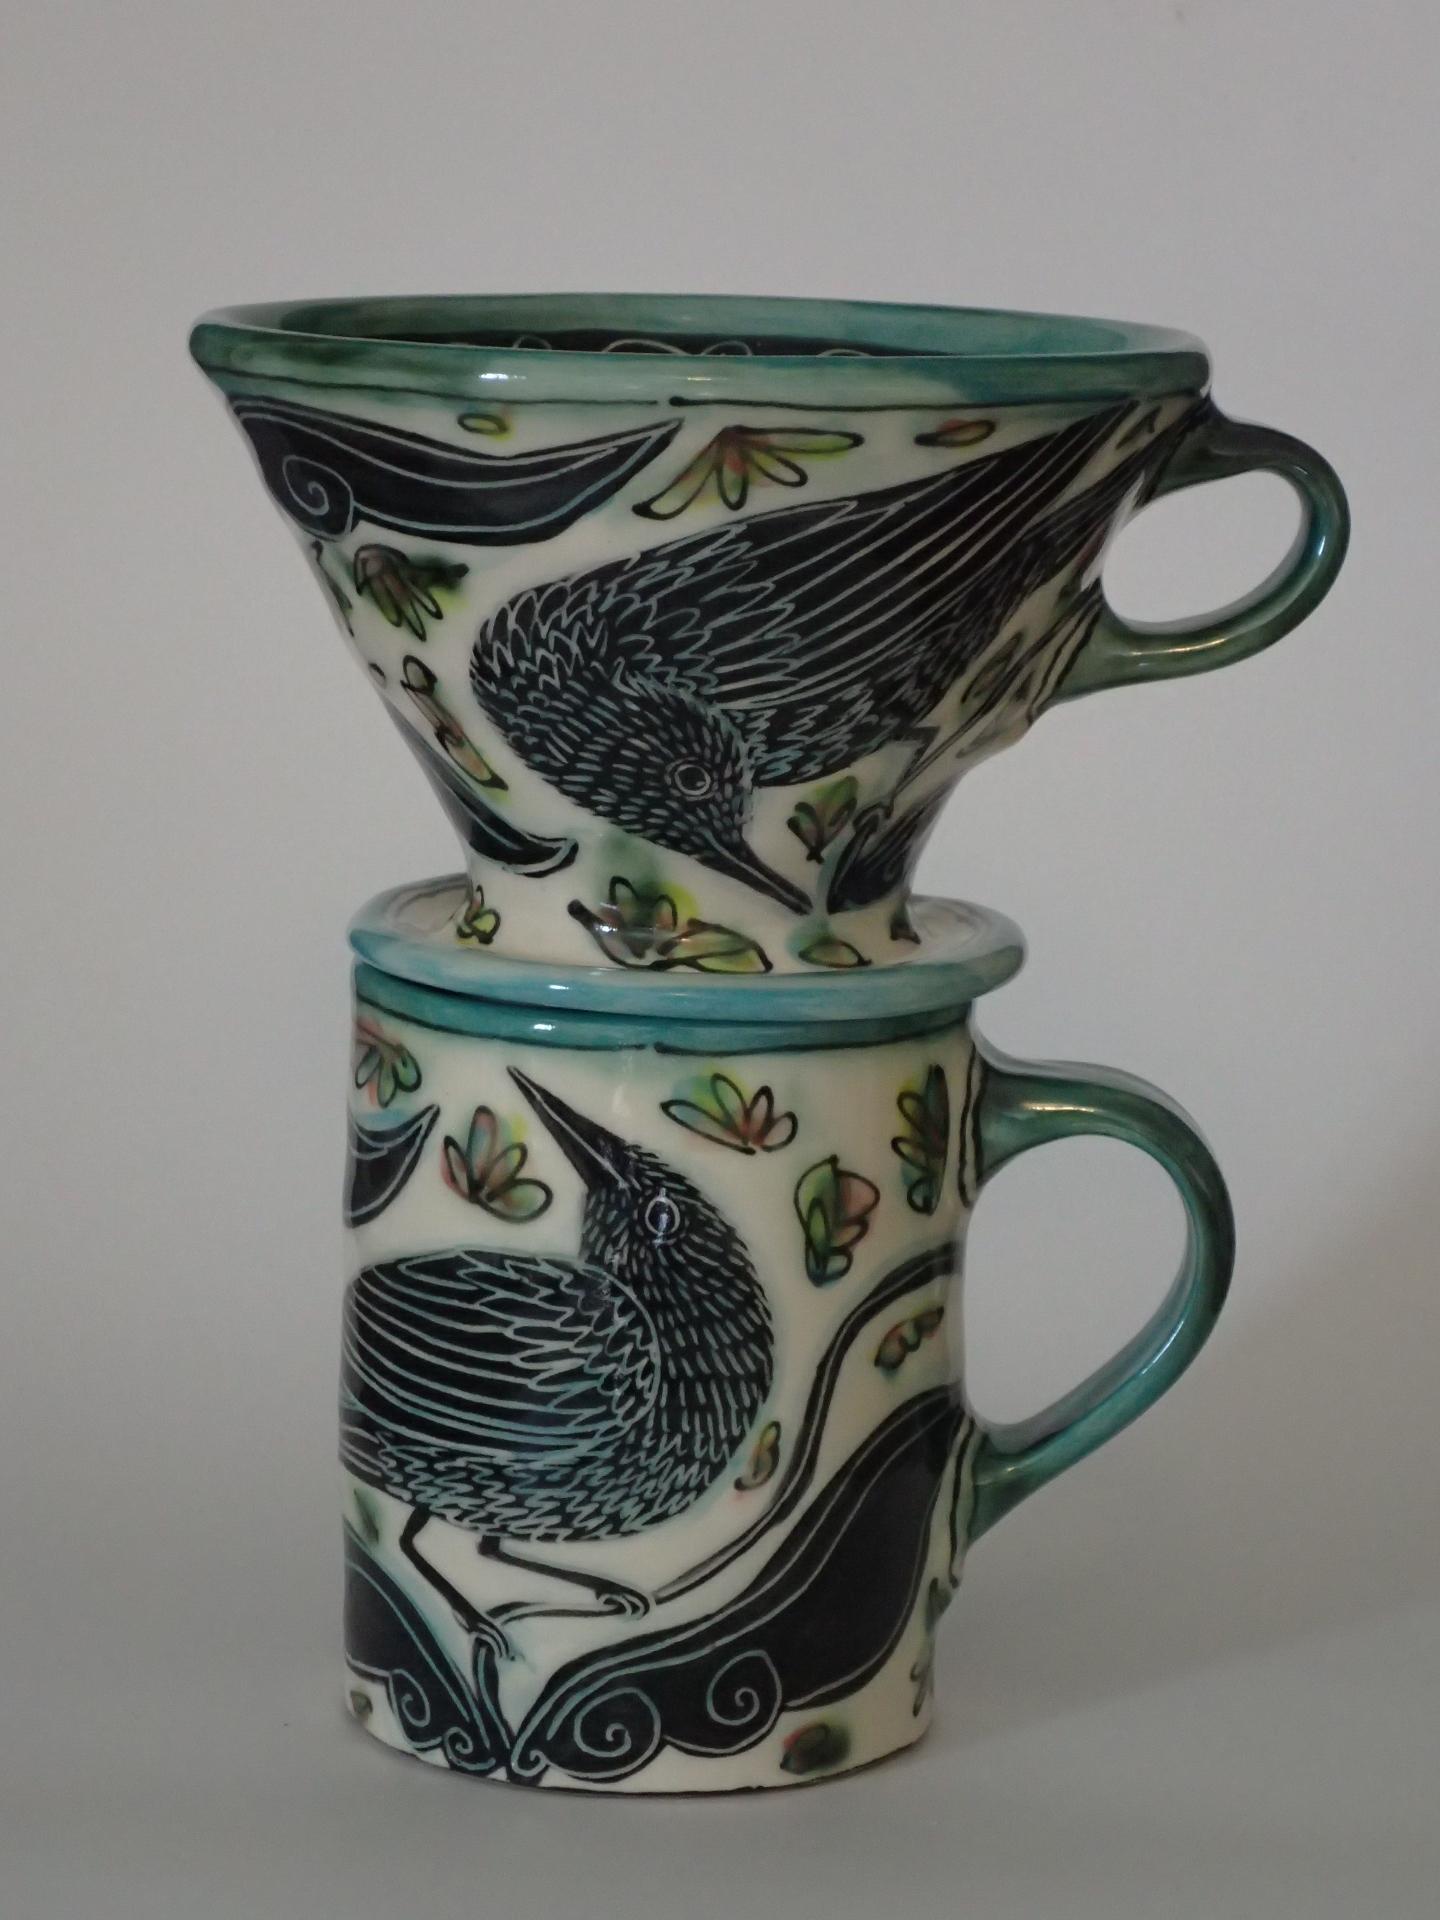 Bird Coffee Mug and Filter - Debra Kuzyk/Ray Mackie